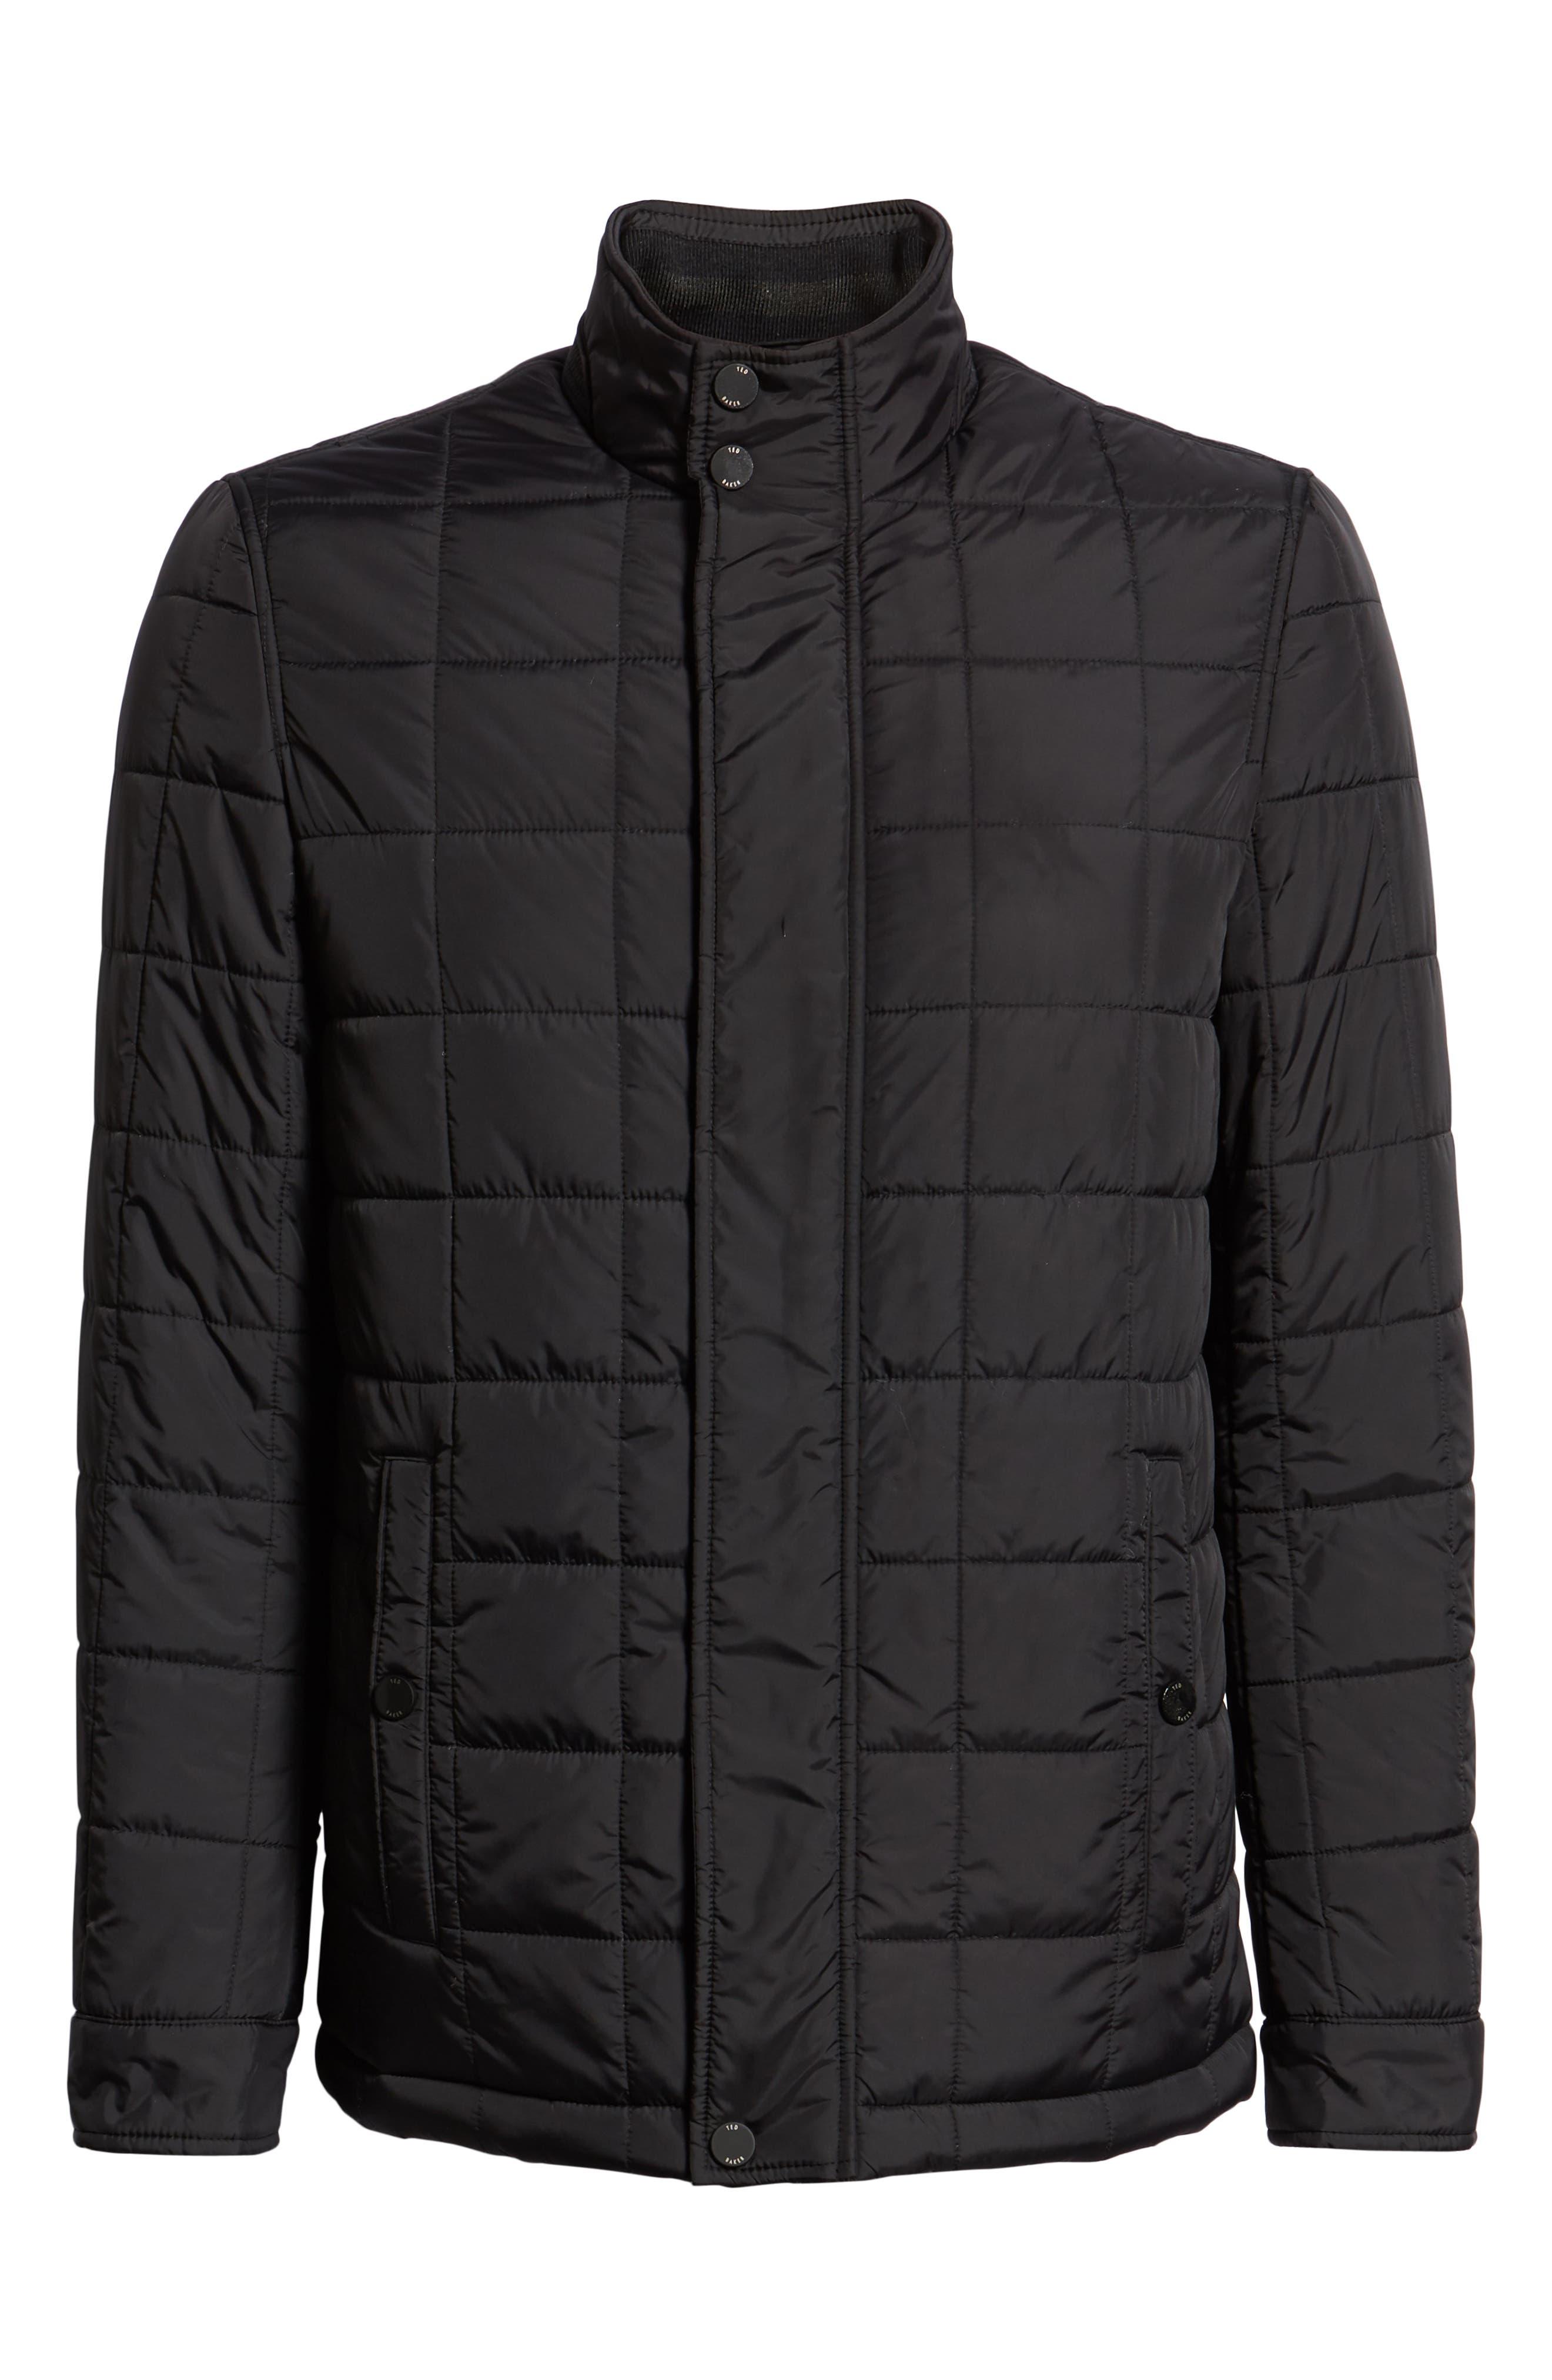 Lesta Quilted Slim Fit Jacket,                             Alternate thumbnail 6, color,                             BLACK